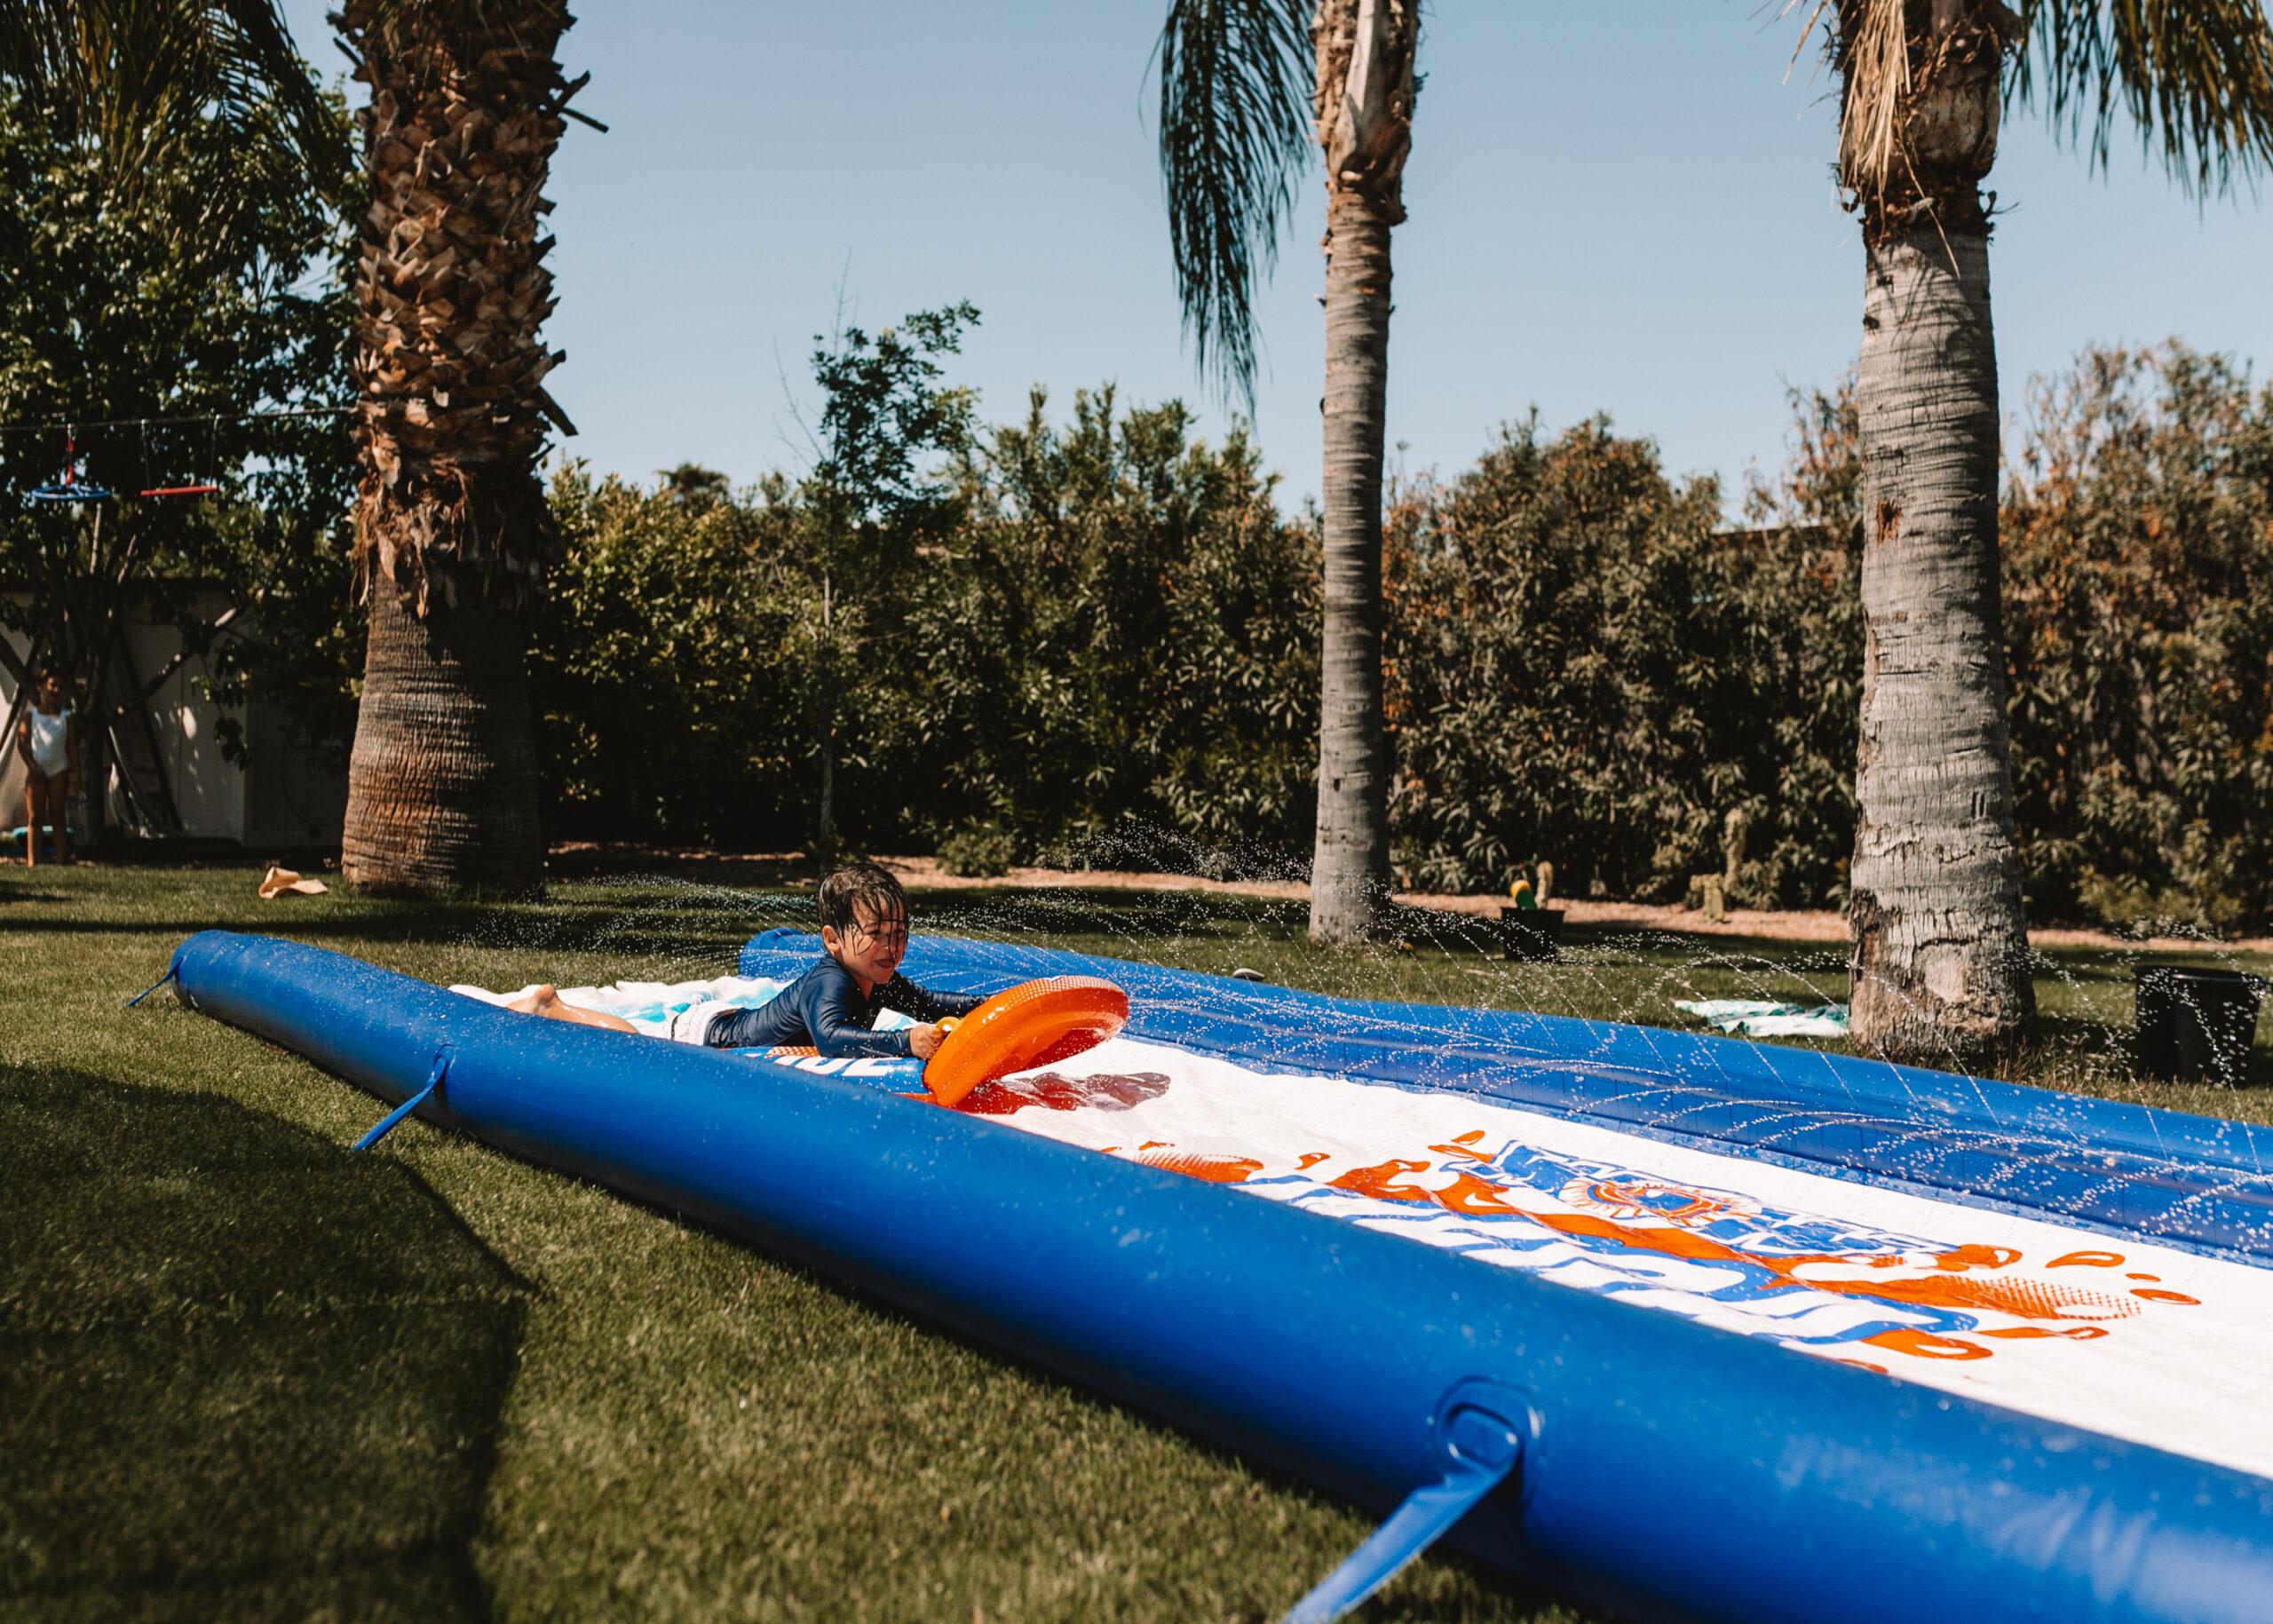 slip and slide water fun for our backyard field day! #slipandslide #backyardfun #waterplay #fieldday